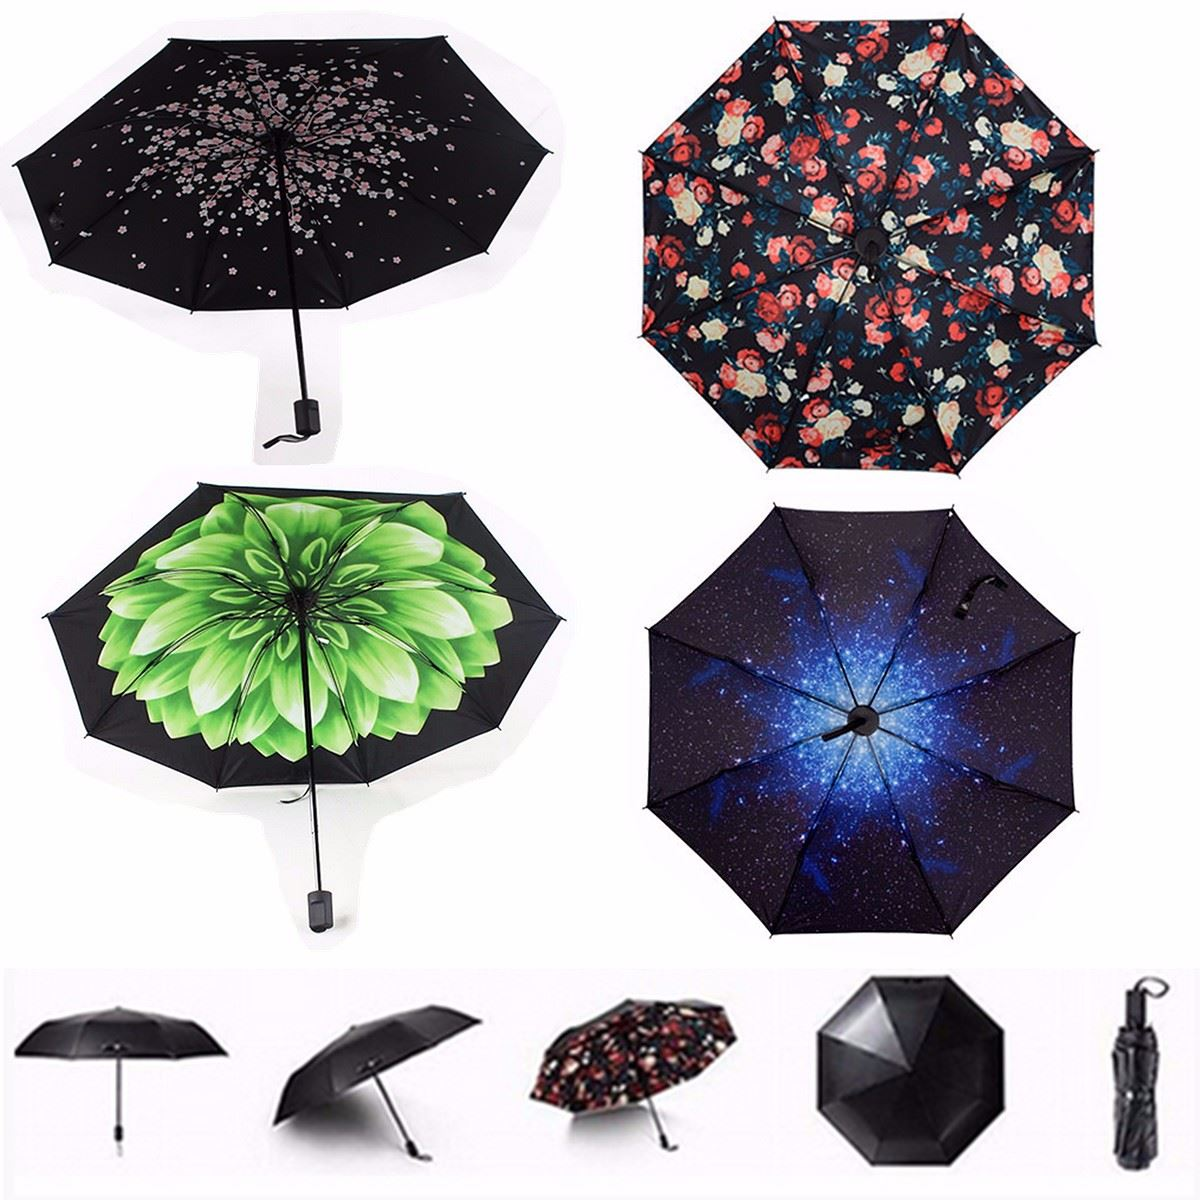 Portable Compact Rainproof Umbrella Windproof Anti Uv Rain Sun Proof Folding Paraguas Parasol Gear Supplies In Umbrellas From Home Garden On